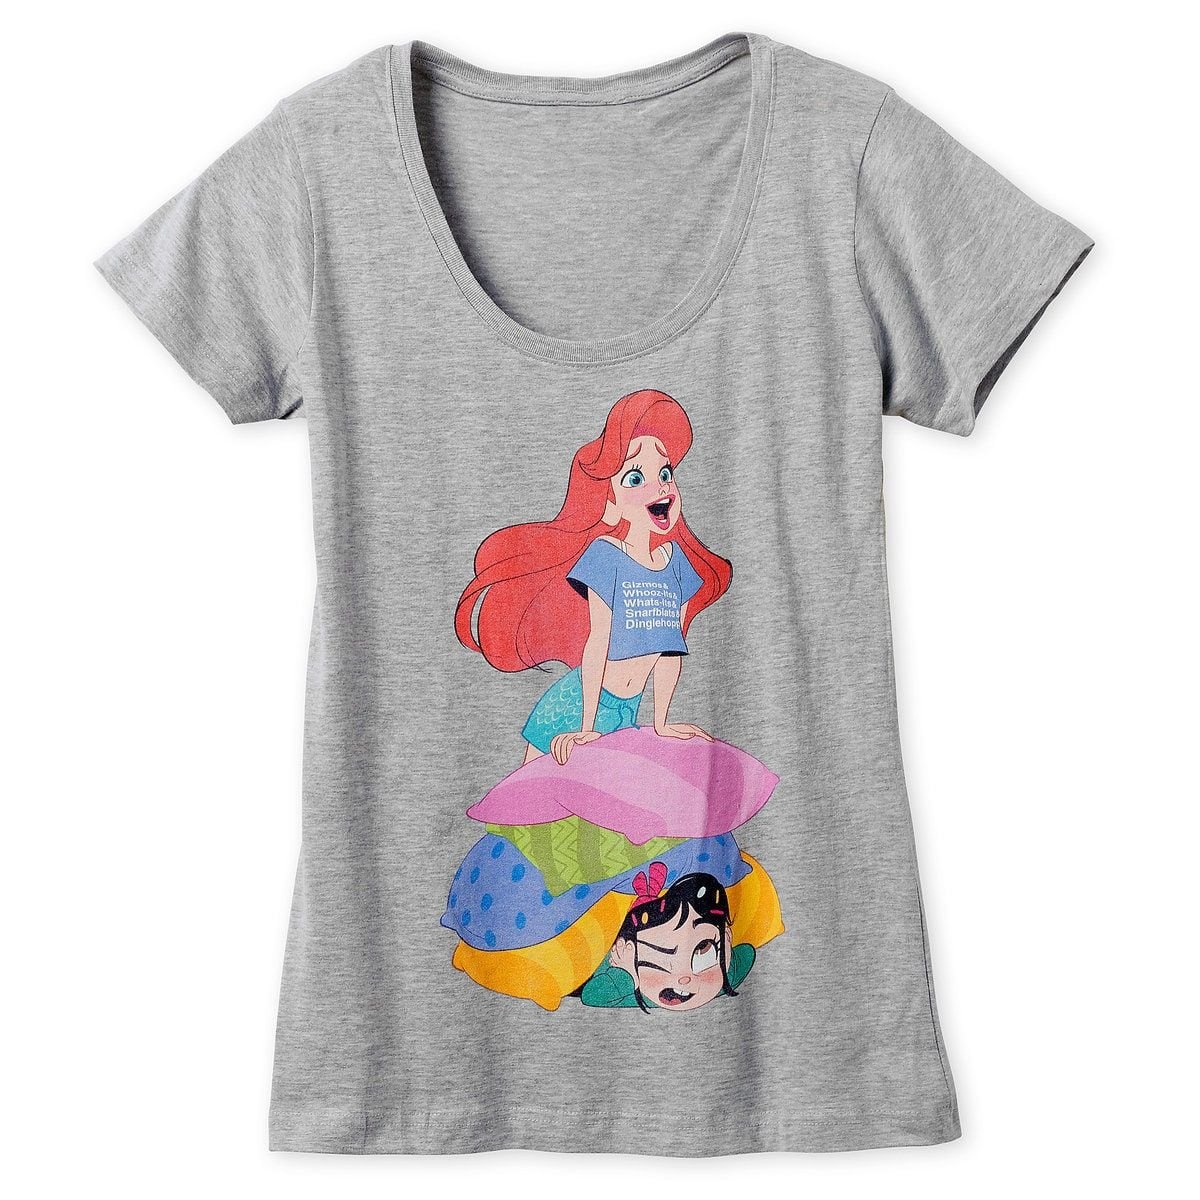 Ralph Breaks The Internet Juniors Comfy Princess Squad T-Shirt